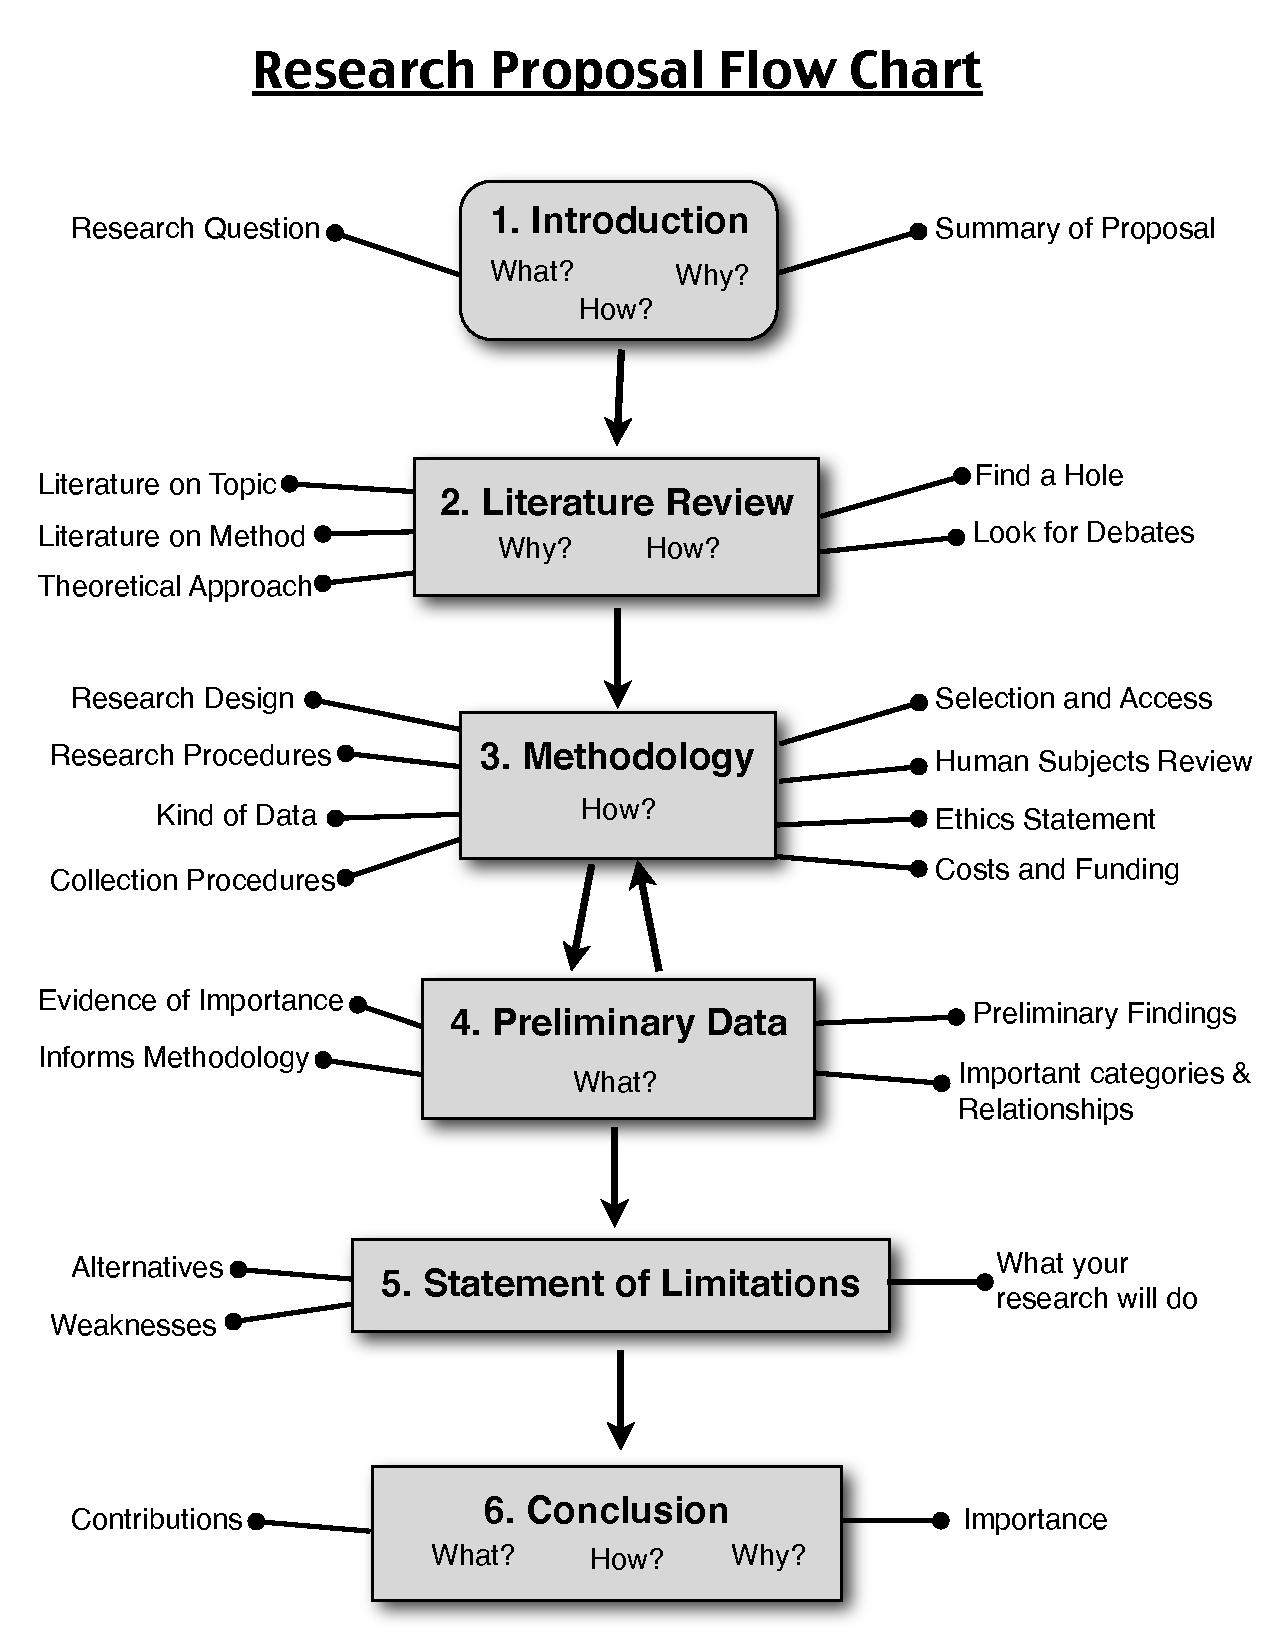 Research Proposal Flow Chart